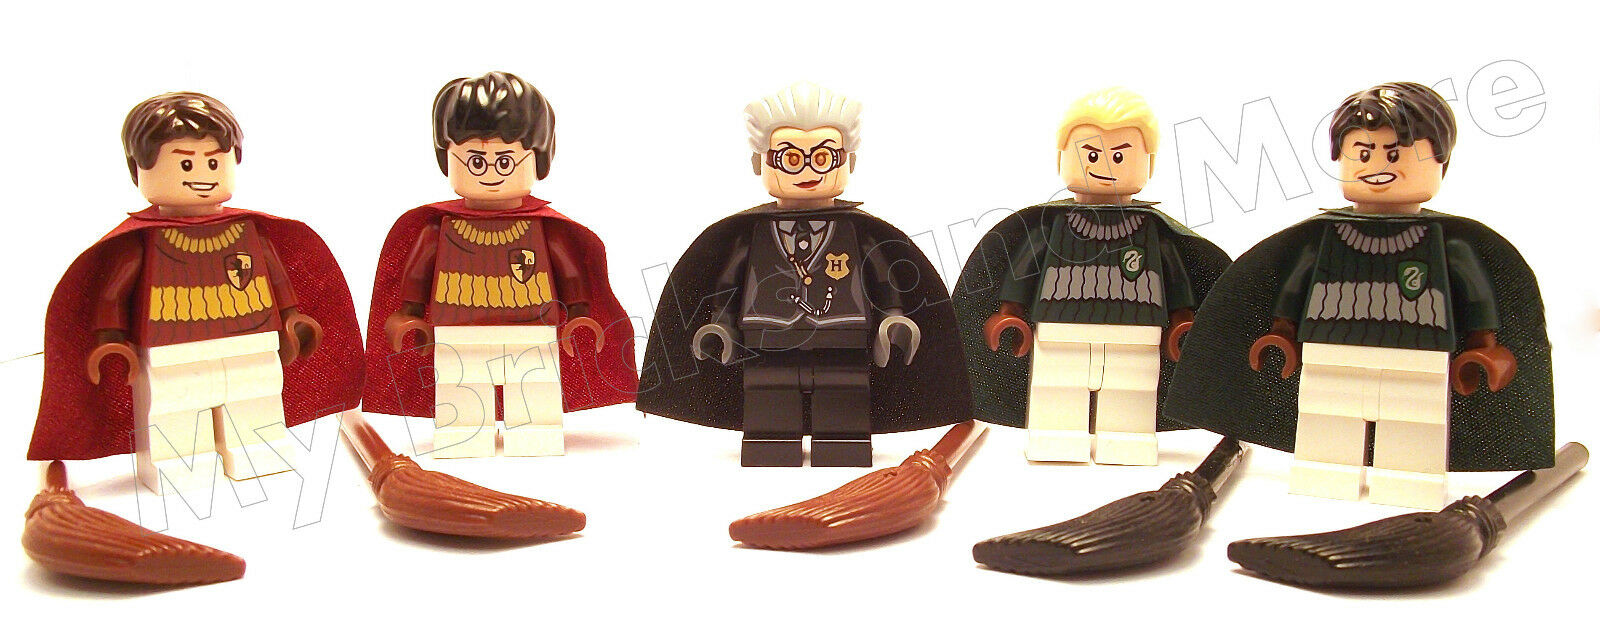 Lego Harry Harry Harry Potter, Draco, Flint, Oliver, and Hooch Minifigures 4737 100% REAL c3f2b8